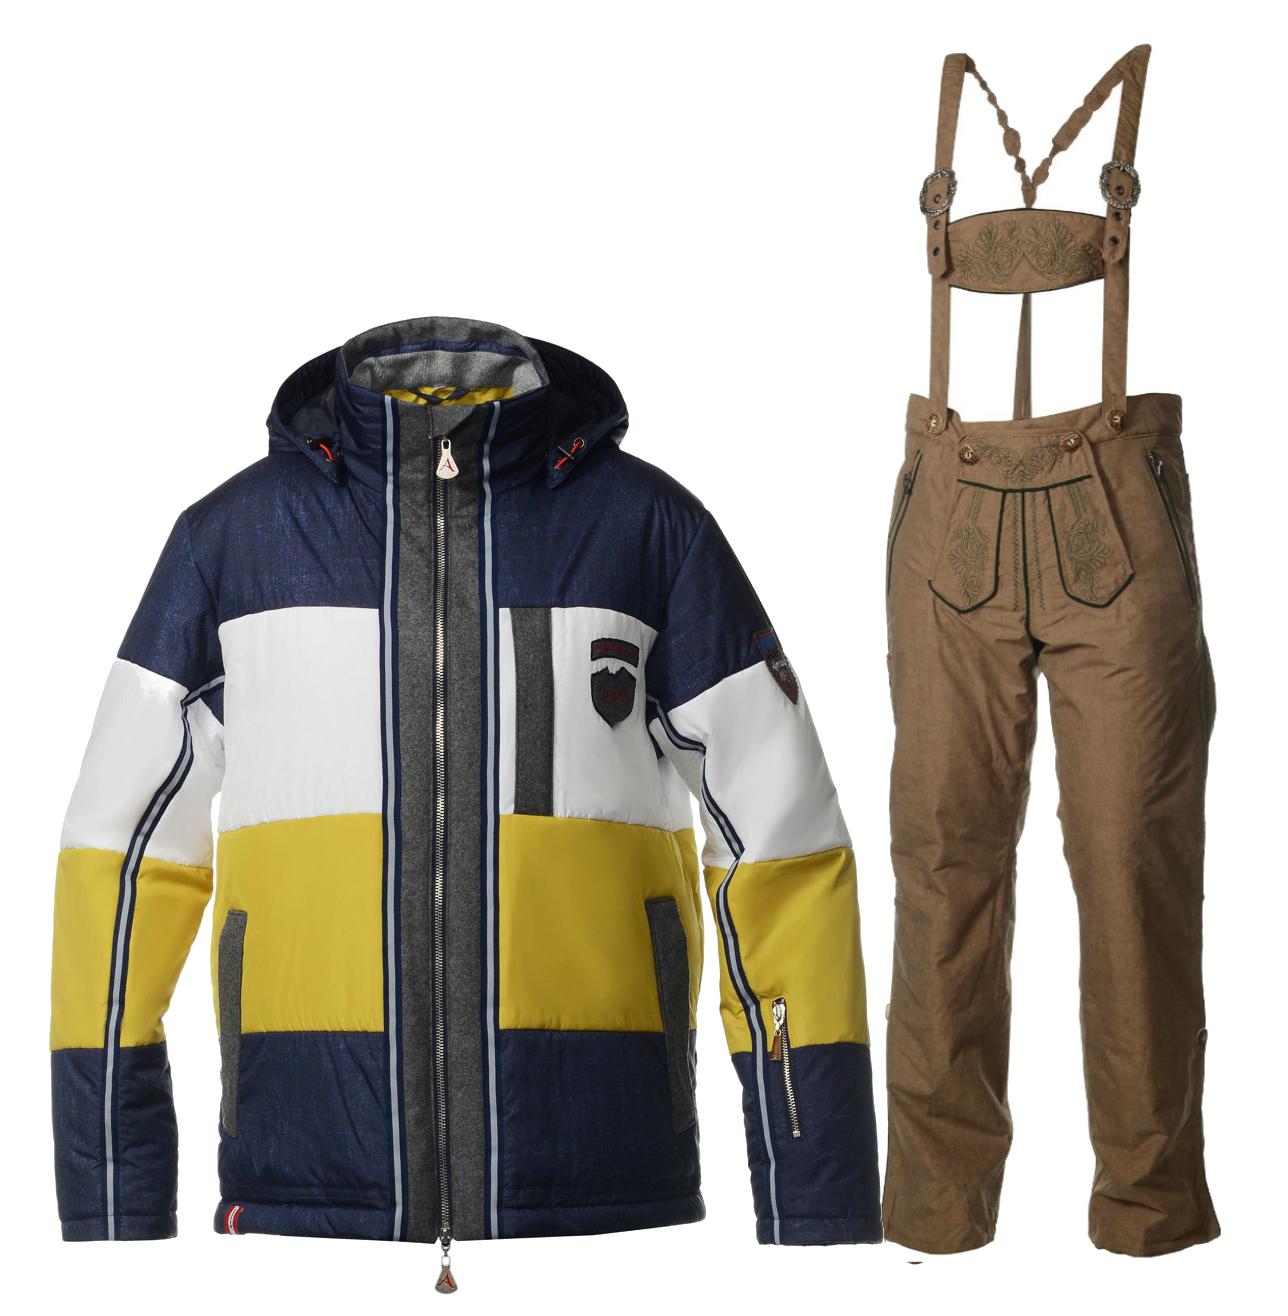 Мужской горнолыжный костюм Almrausch Steinpass-Lois 320109-121136 джинс